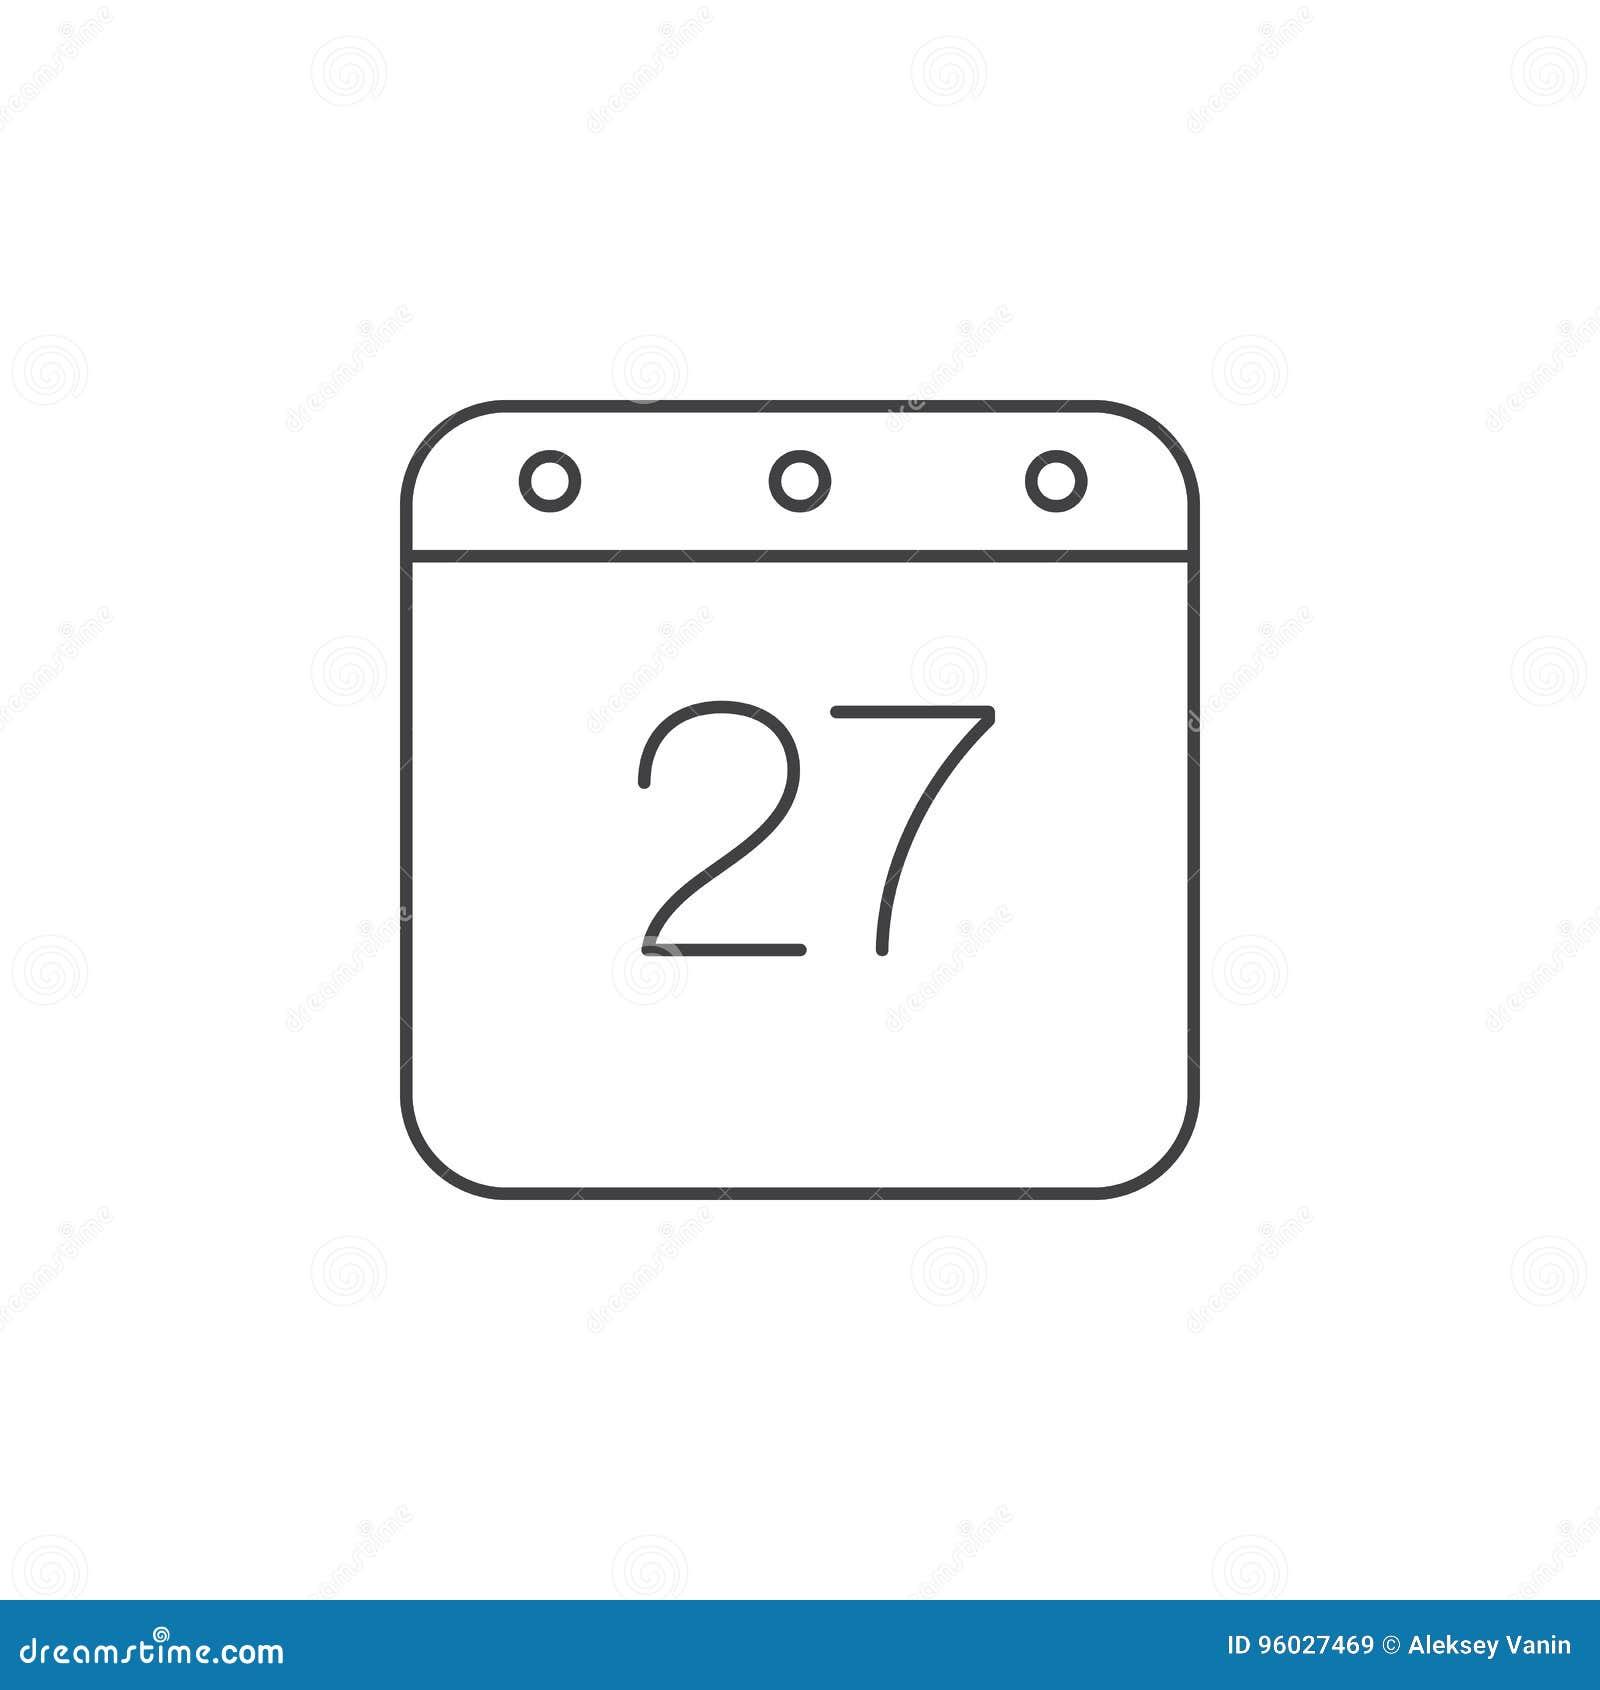 Kalendarz cienka kreskowa ikona, konturu loga wektorowa ilustracja, linea